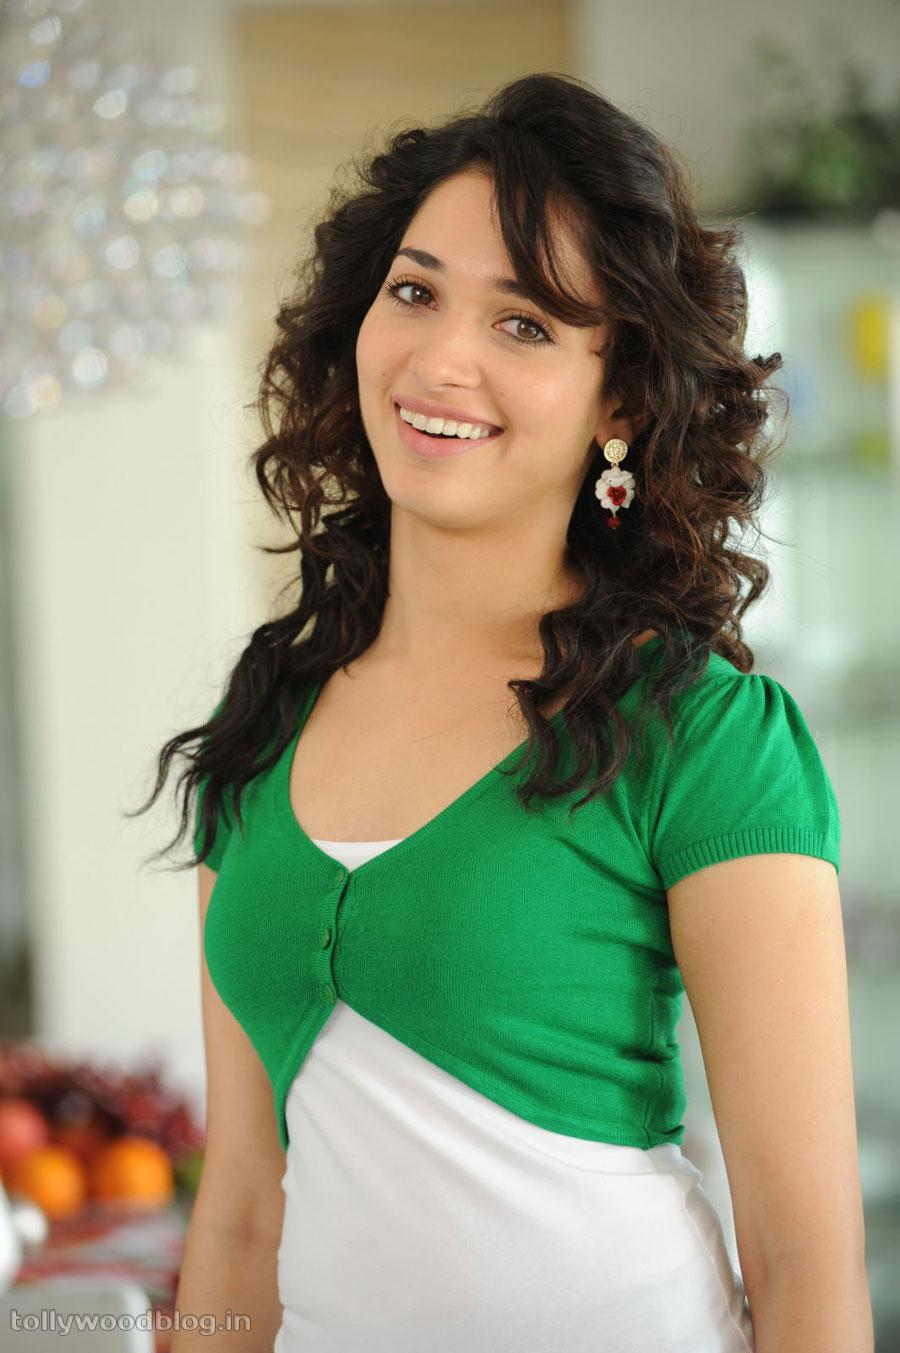 Hairstyles Cuts Tips Tamanna Bhatia Photos